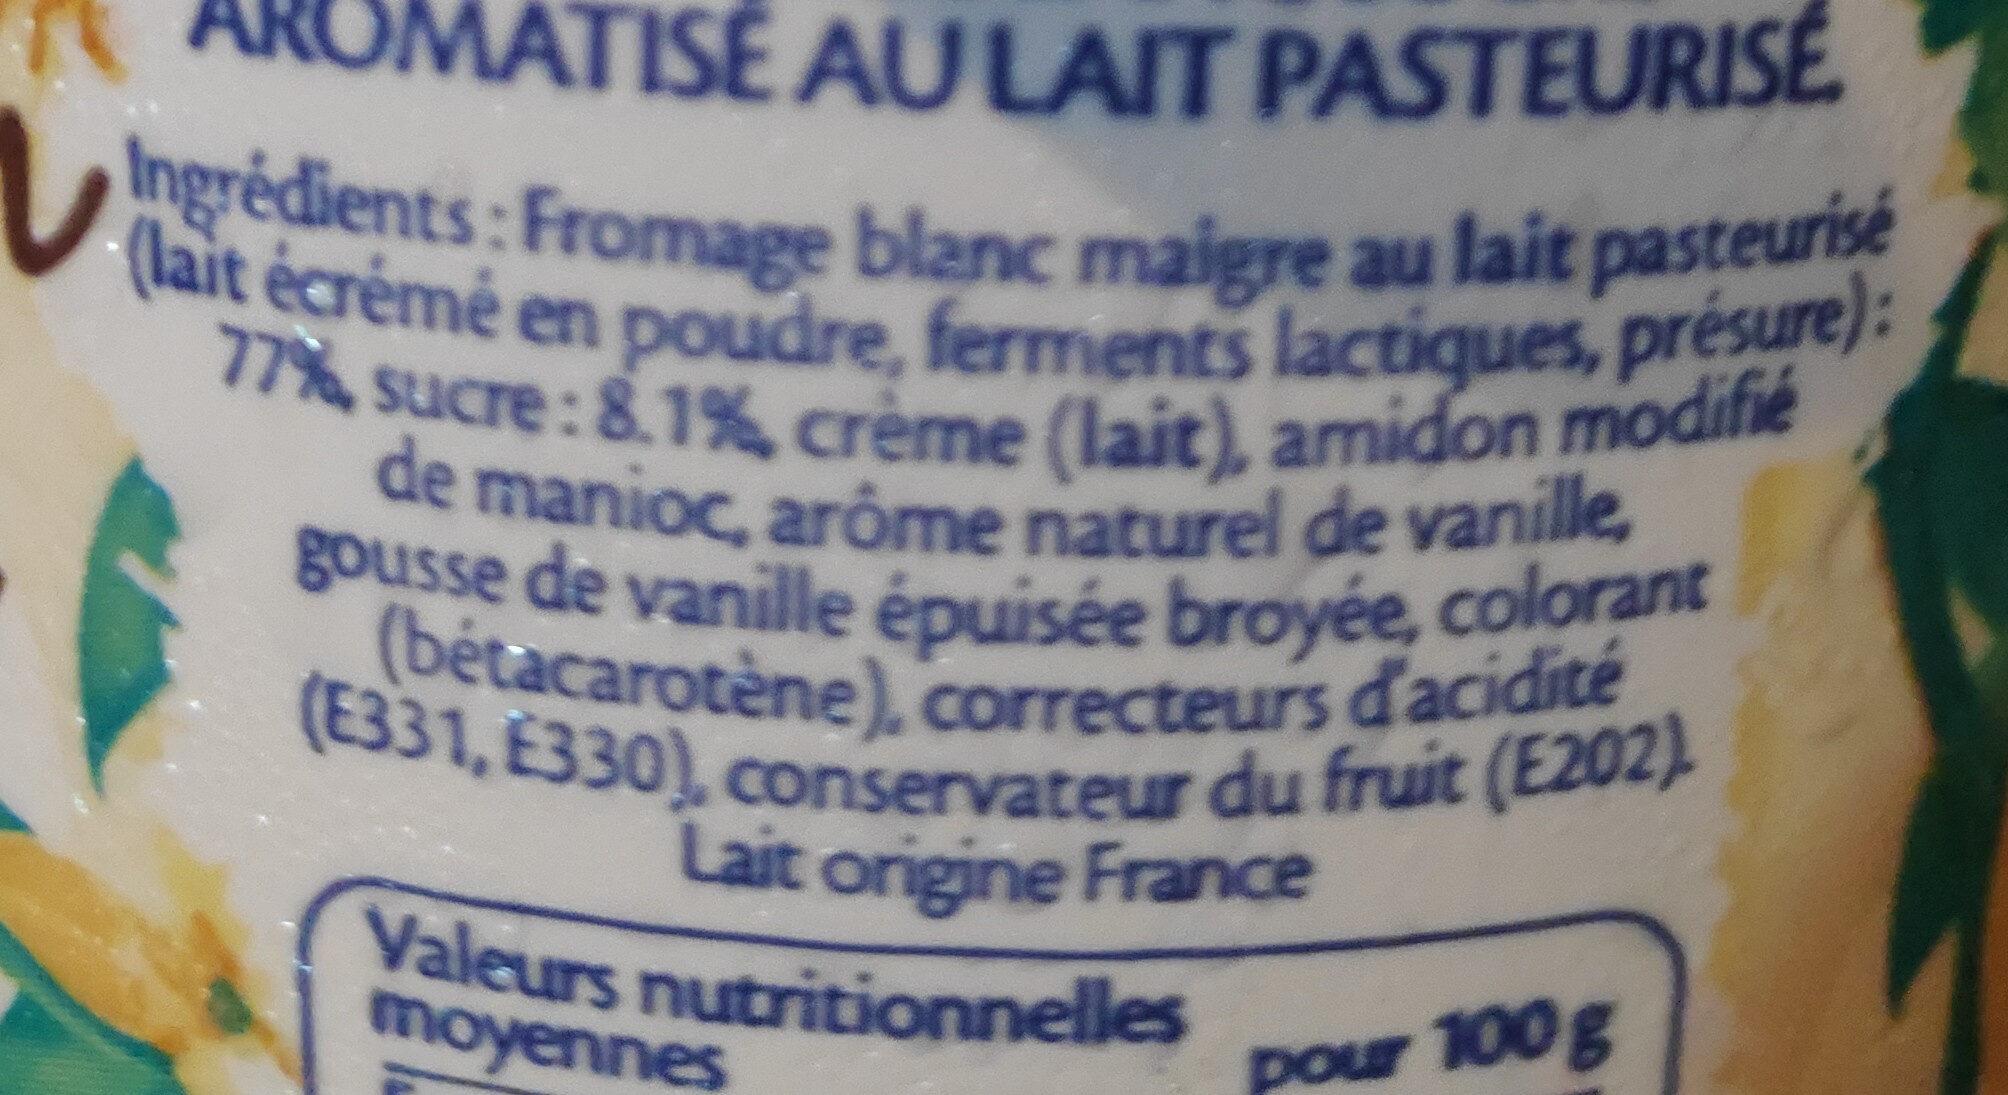 Fromage Blanc Vanille - Ingrédients - fr